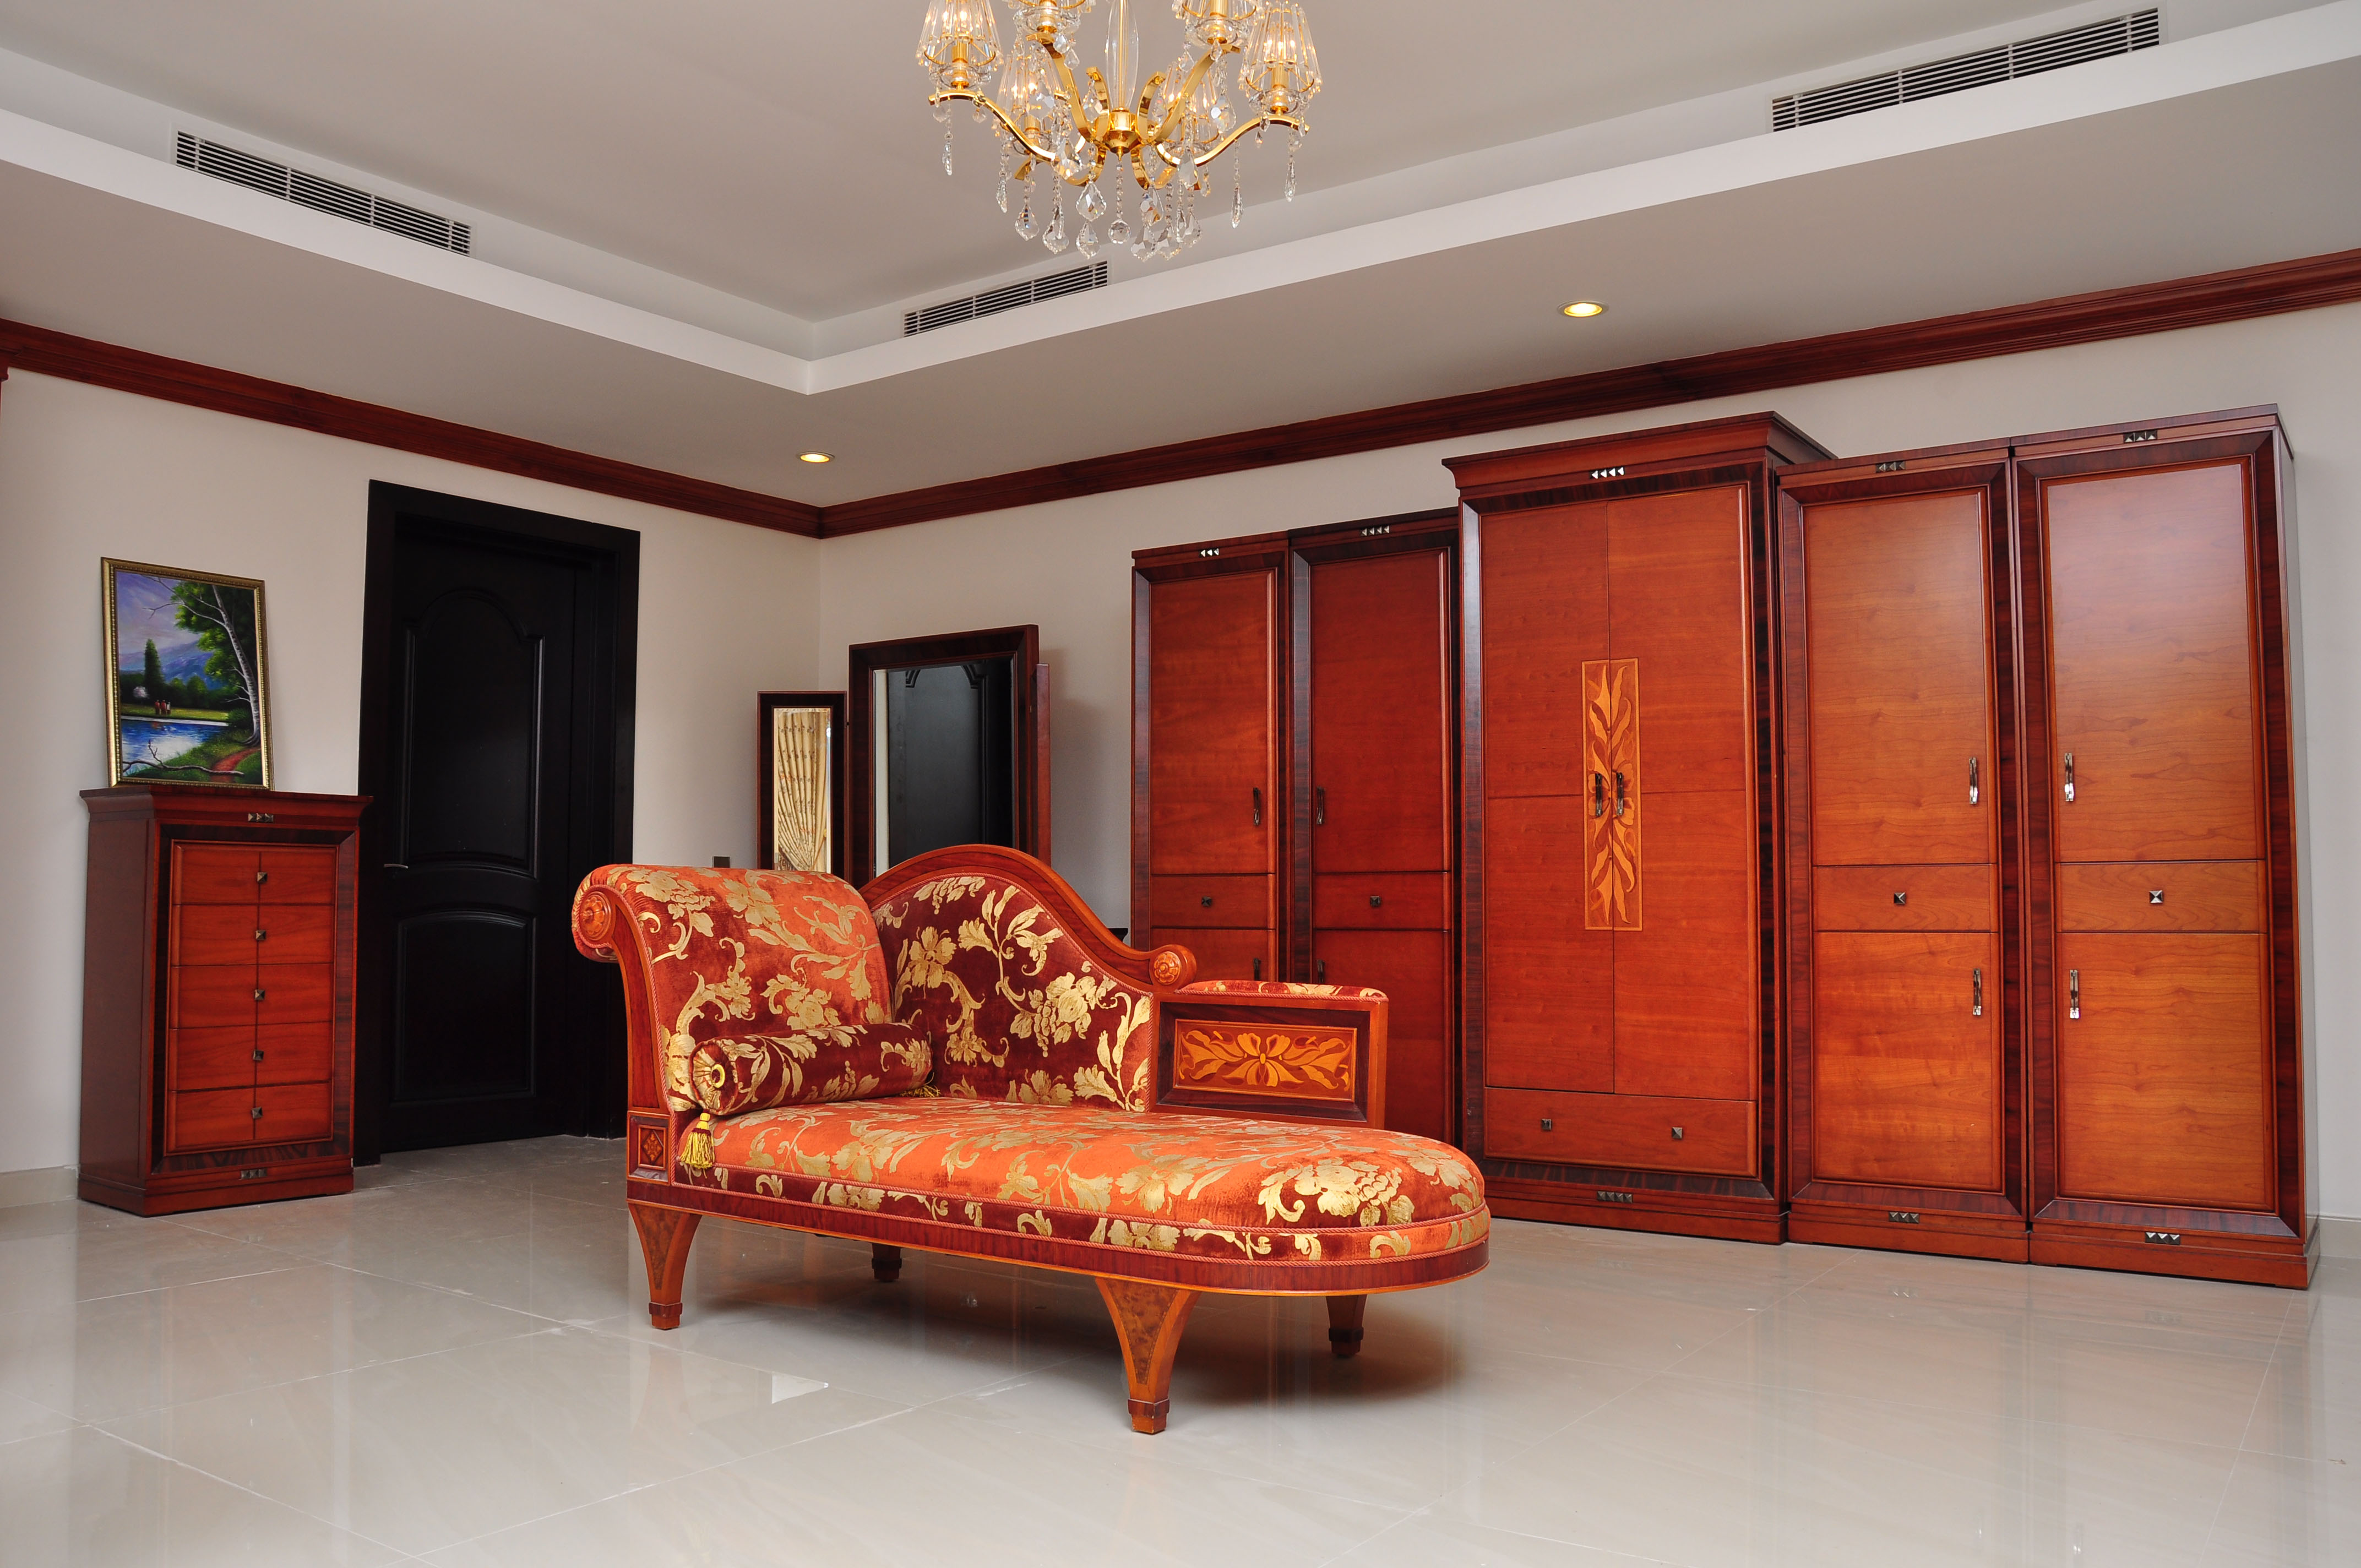 Royal Room and Sofa, Architect, Living, Wooden, Villa, HQ Photo